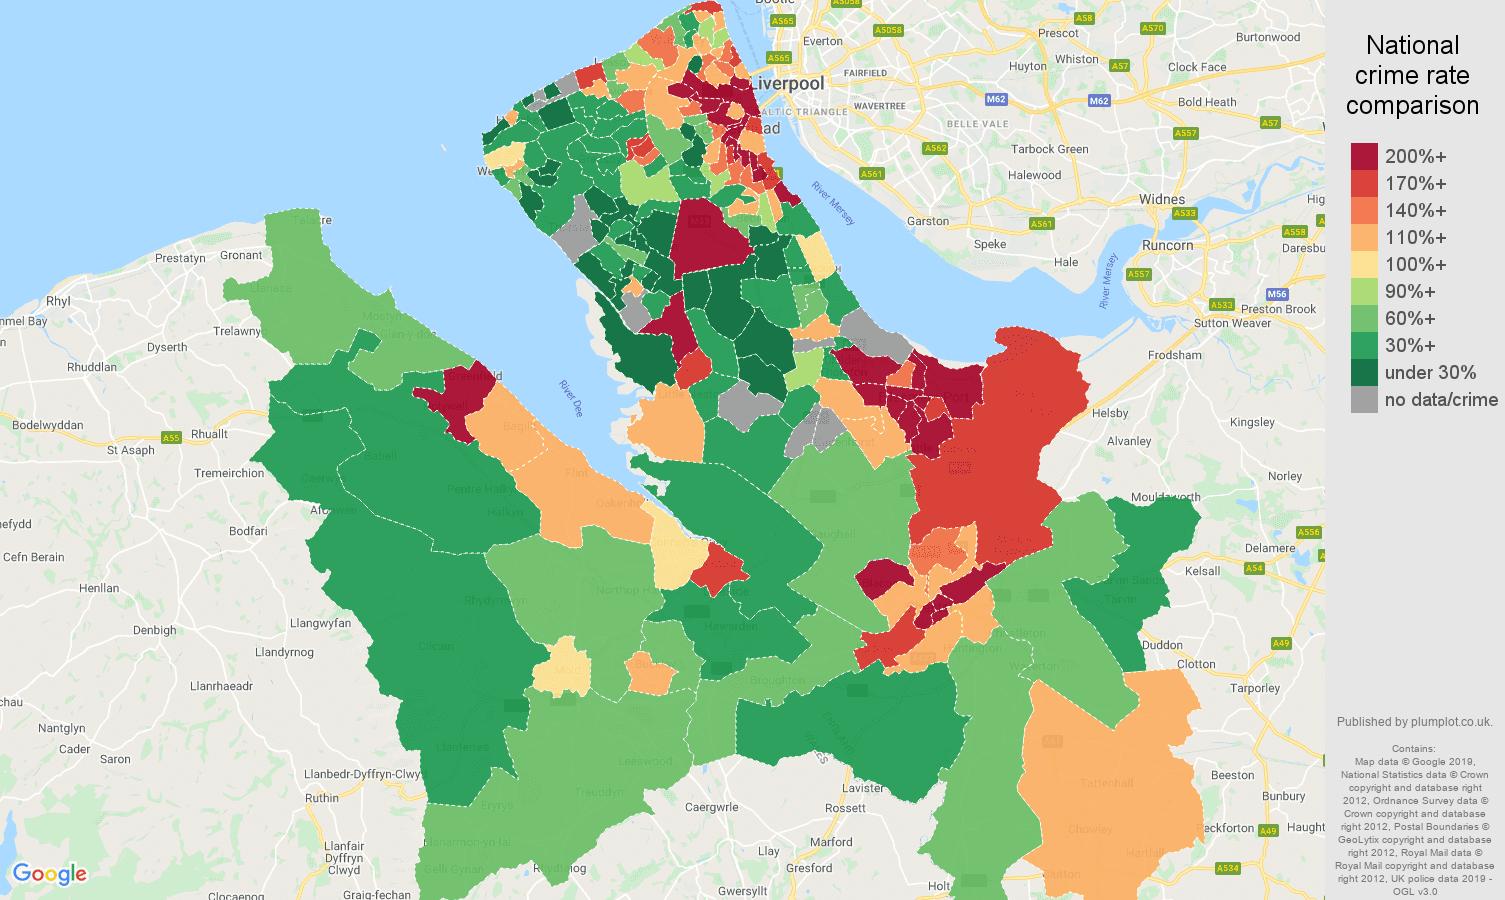 Chester public order crime rate comparison map